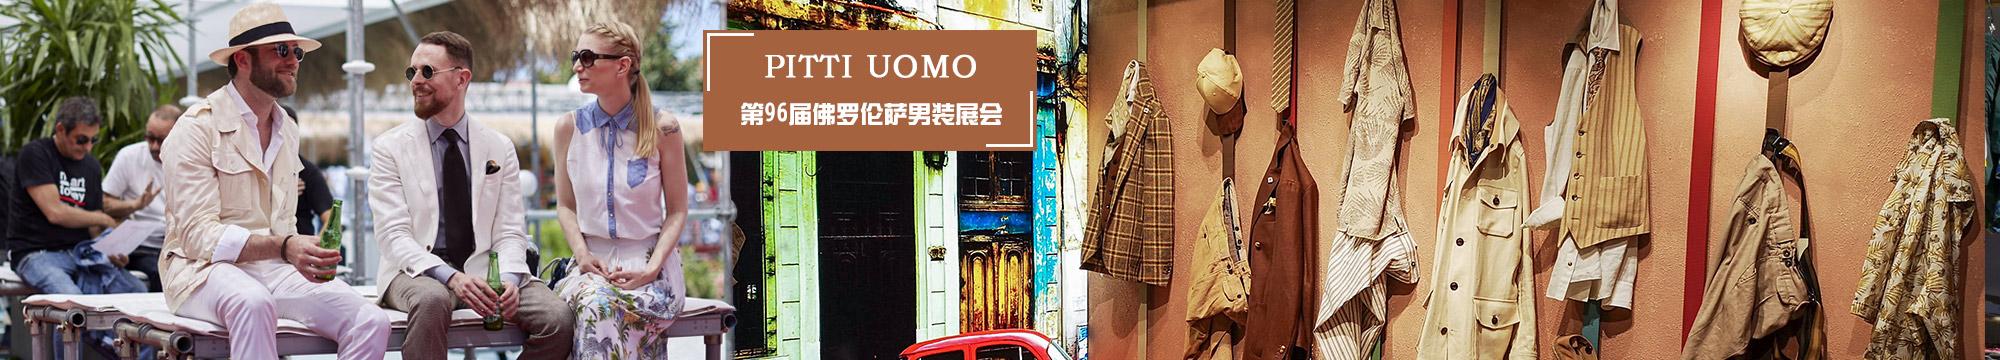 Pitti Uomo--佛罗伦萨男装展会综合分析